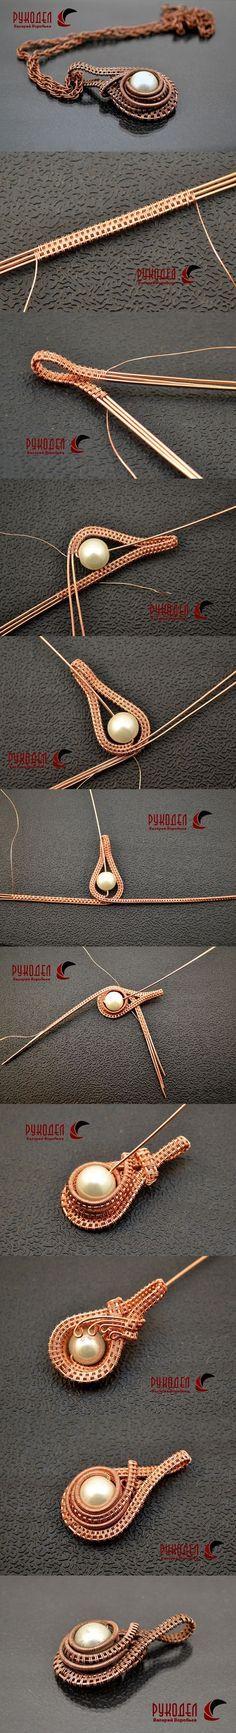 Wire Wrap Pendant. Подвеска из проволоки с бусиной в технике Wire wrap. | Рукодел – magazin-rukodel.ru/